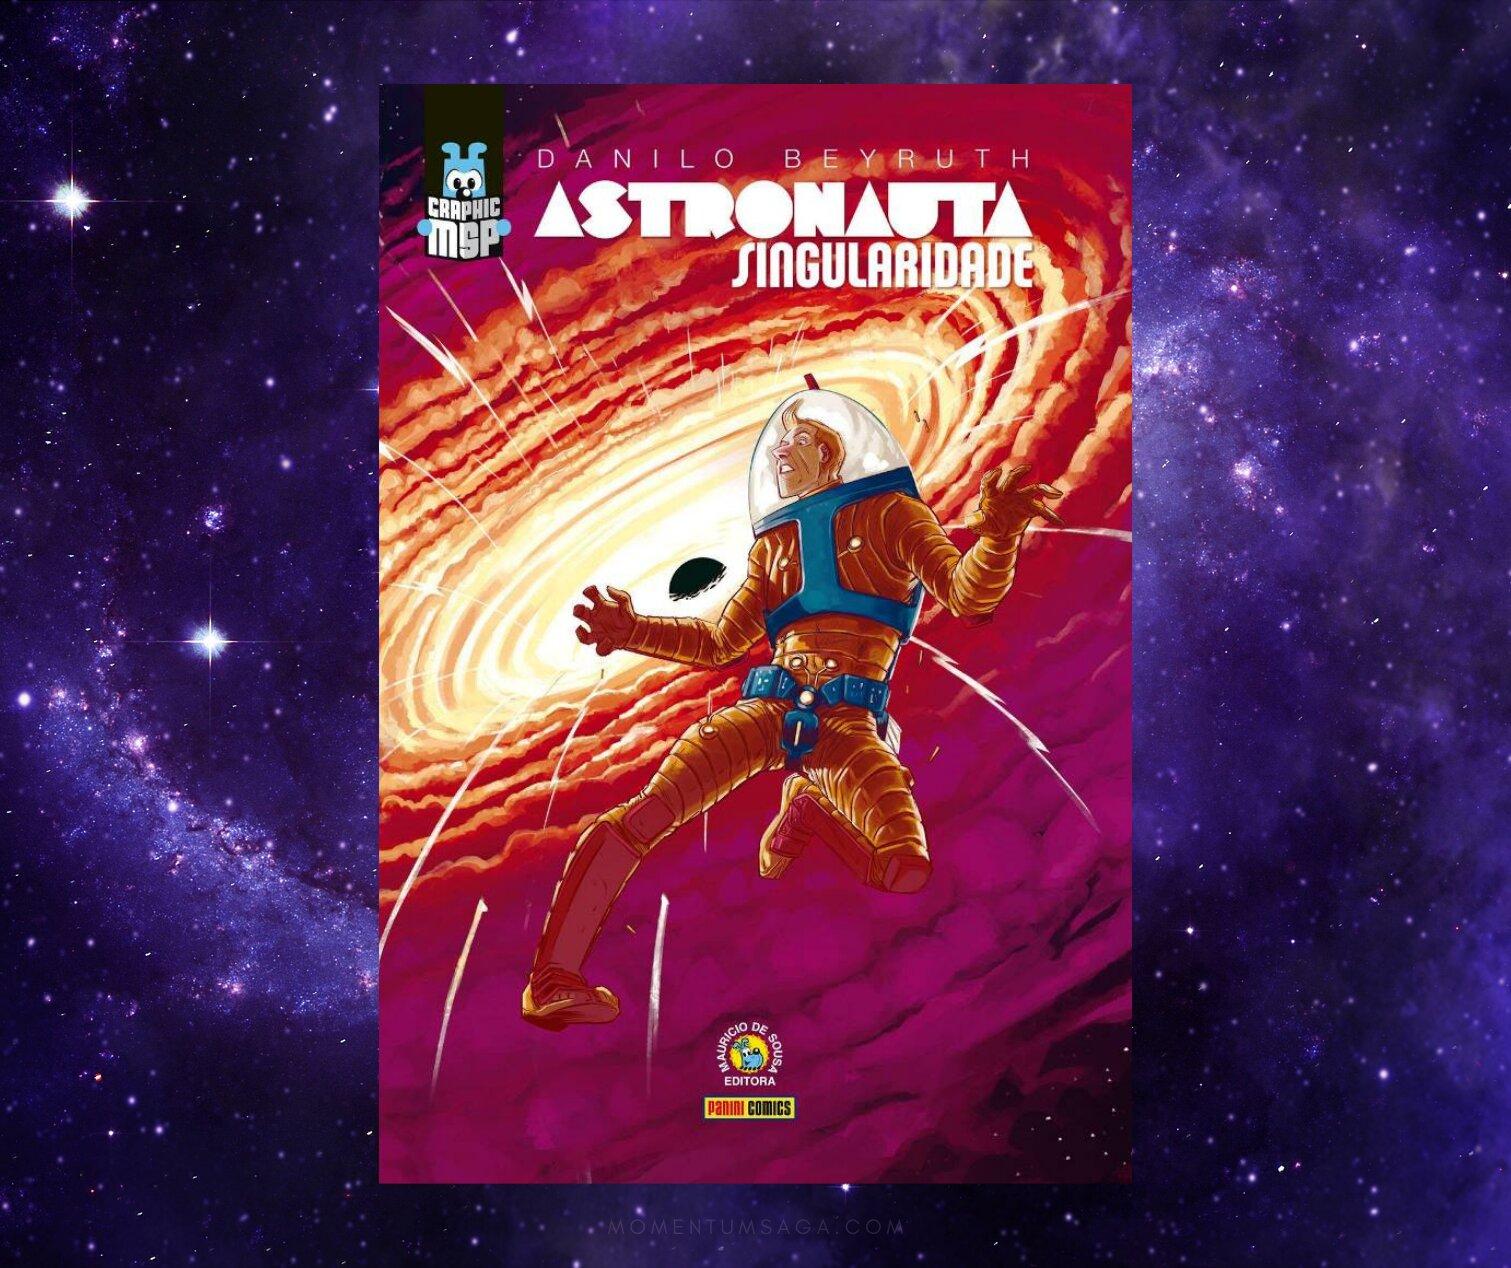 Resenha: Astronauta Singularidade, de Danilo Beyruth